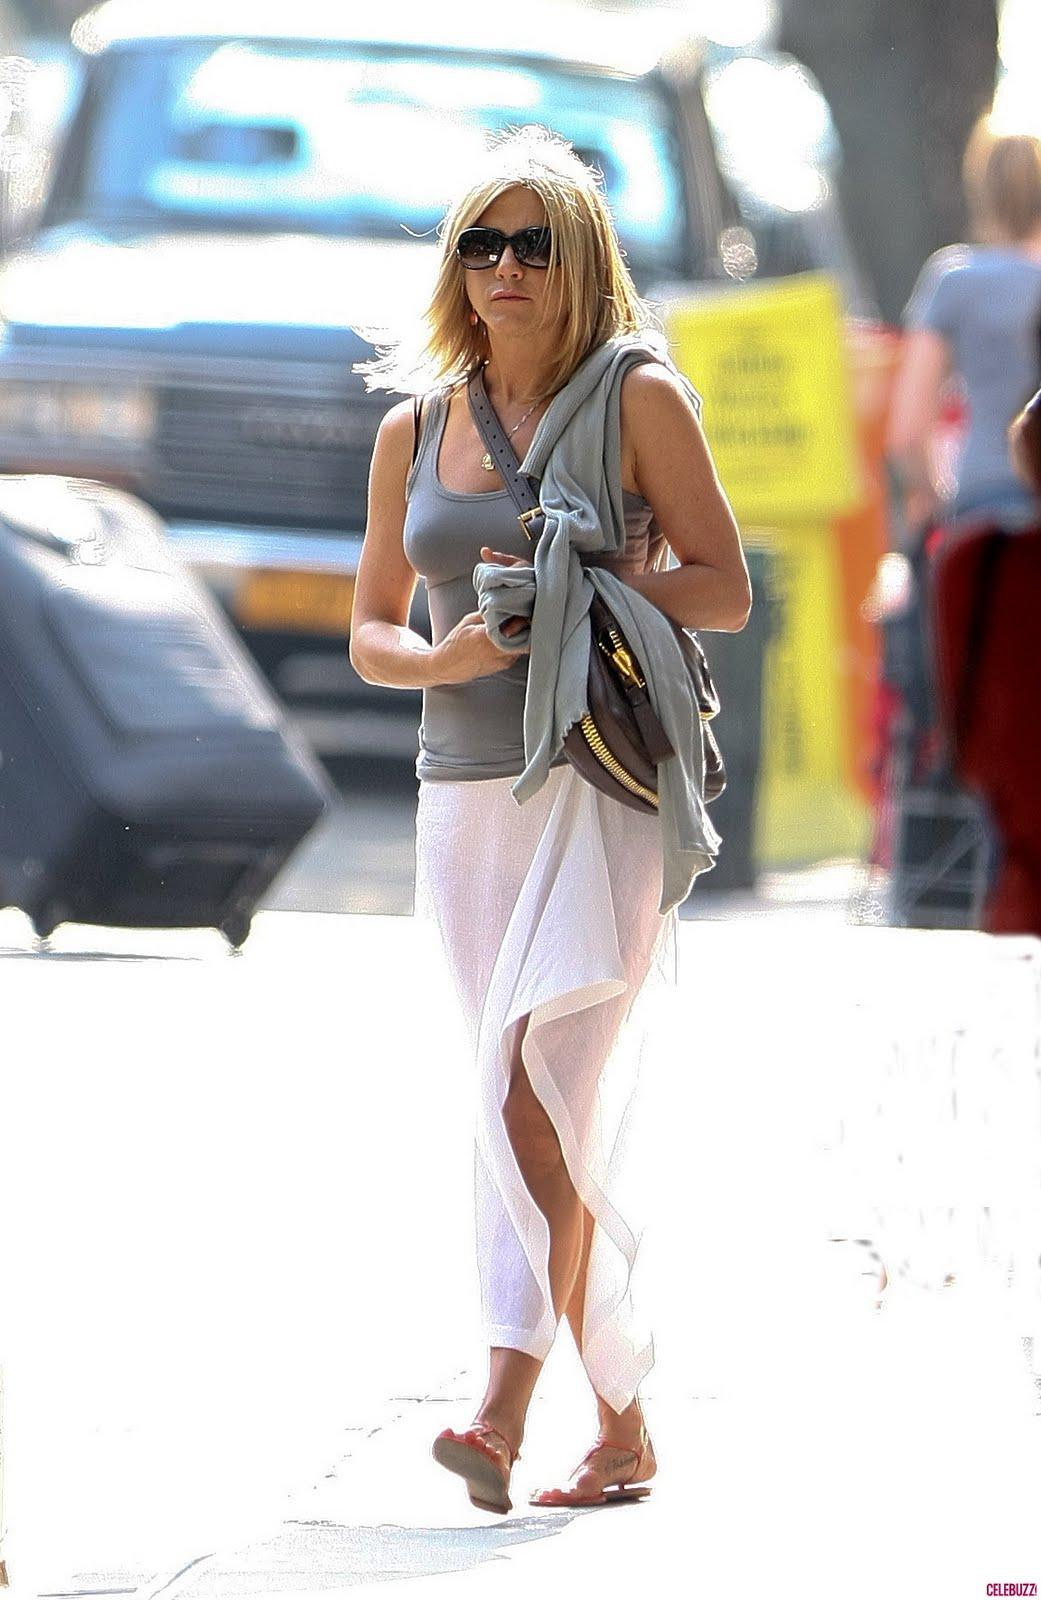 http://1.bp.blogspot.com/-rLcRvbzNBvg/TgLdzUHqLYI/AAAAAAAAJWw/Uy7v9TCmLaE/s1600/jennifer-aniston-skirt-nyc-6-1152x1771.JPG